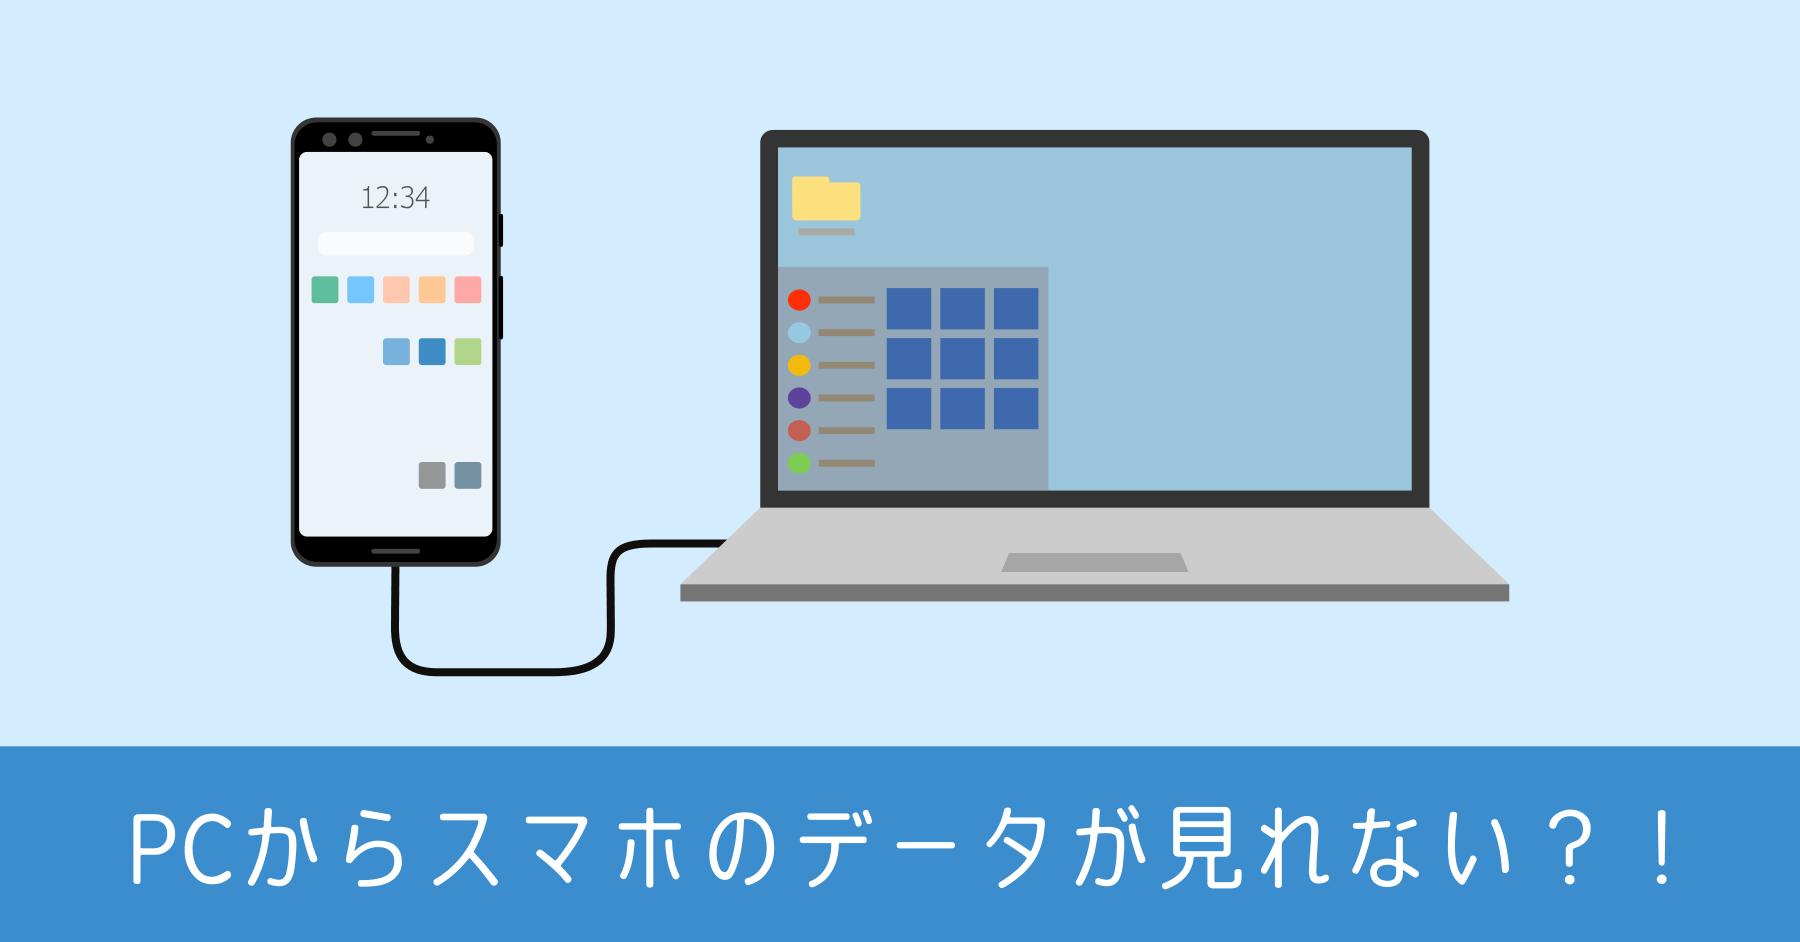 Android パソコンに接続してファイル情報を参照